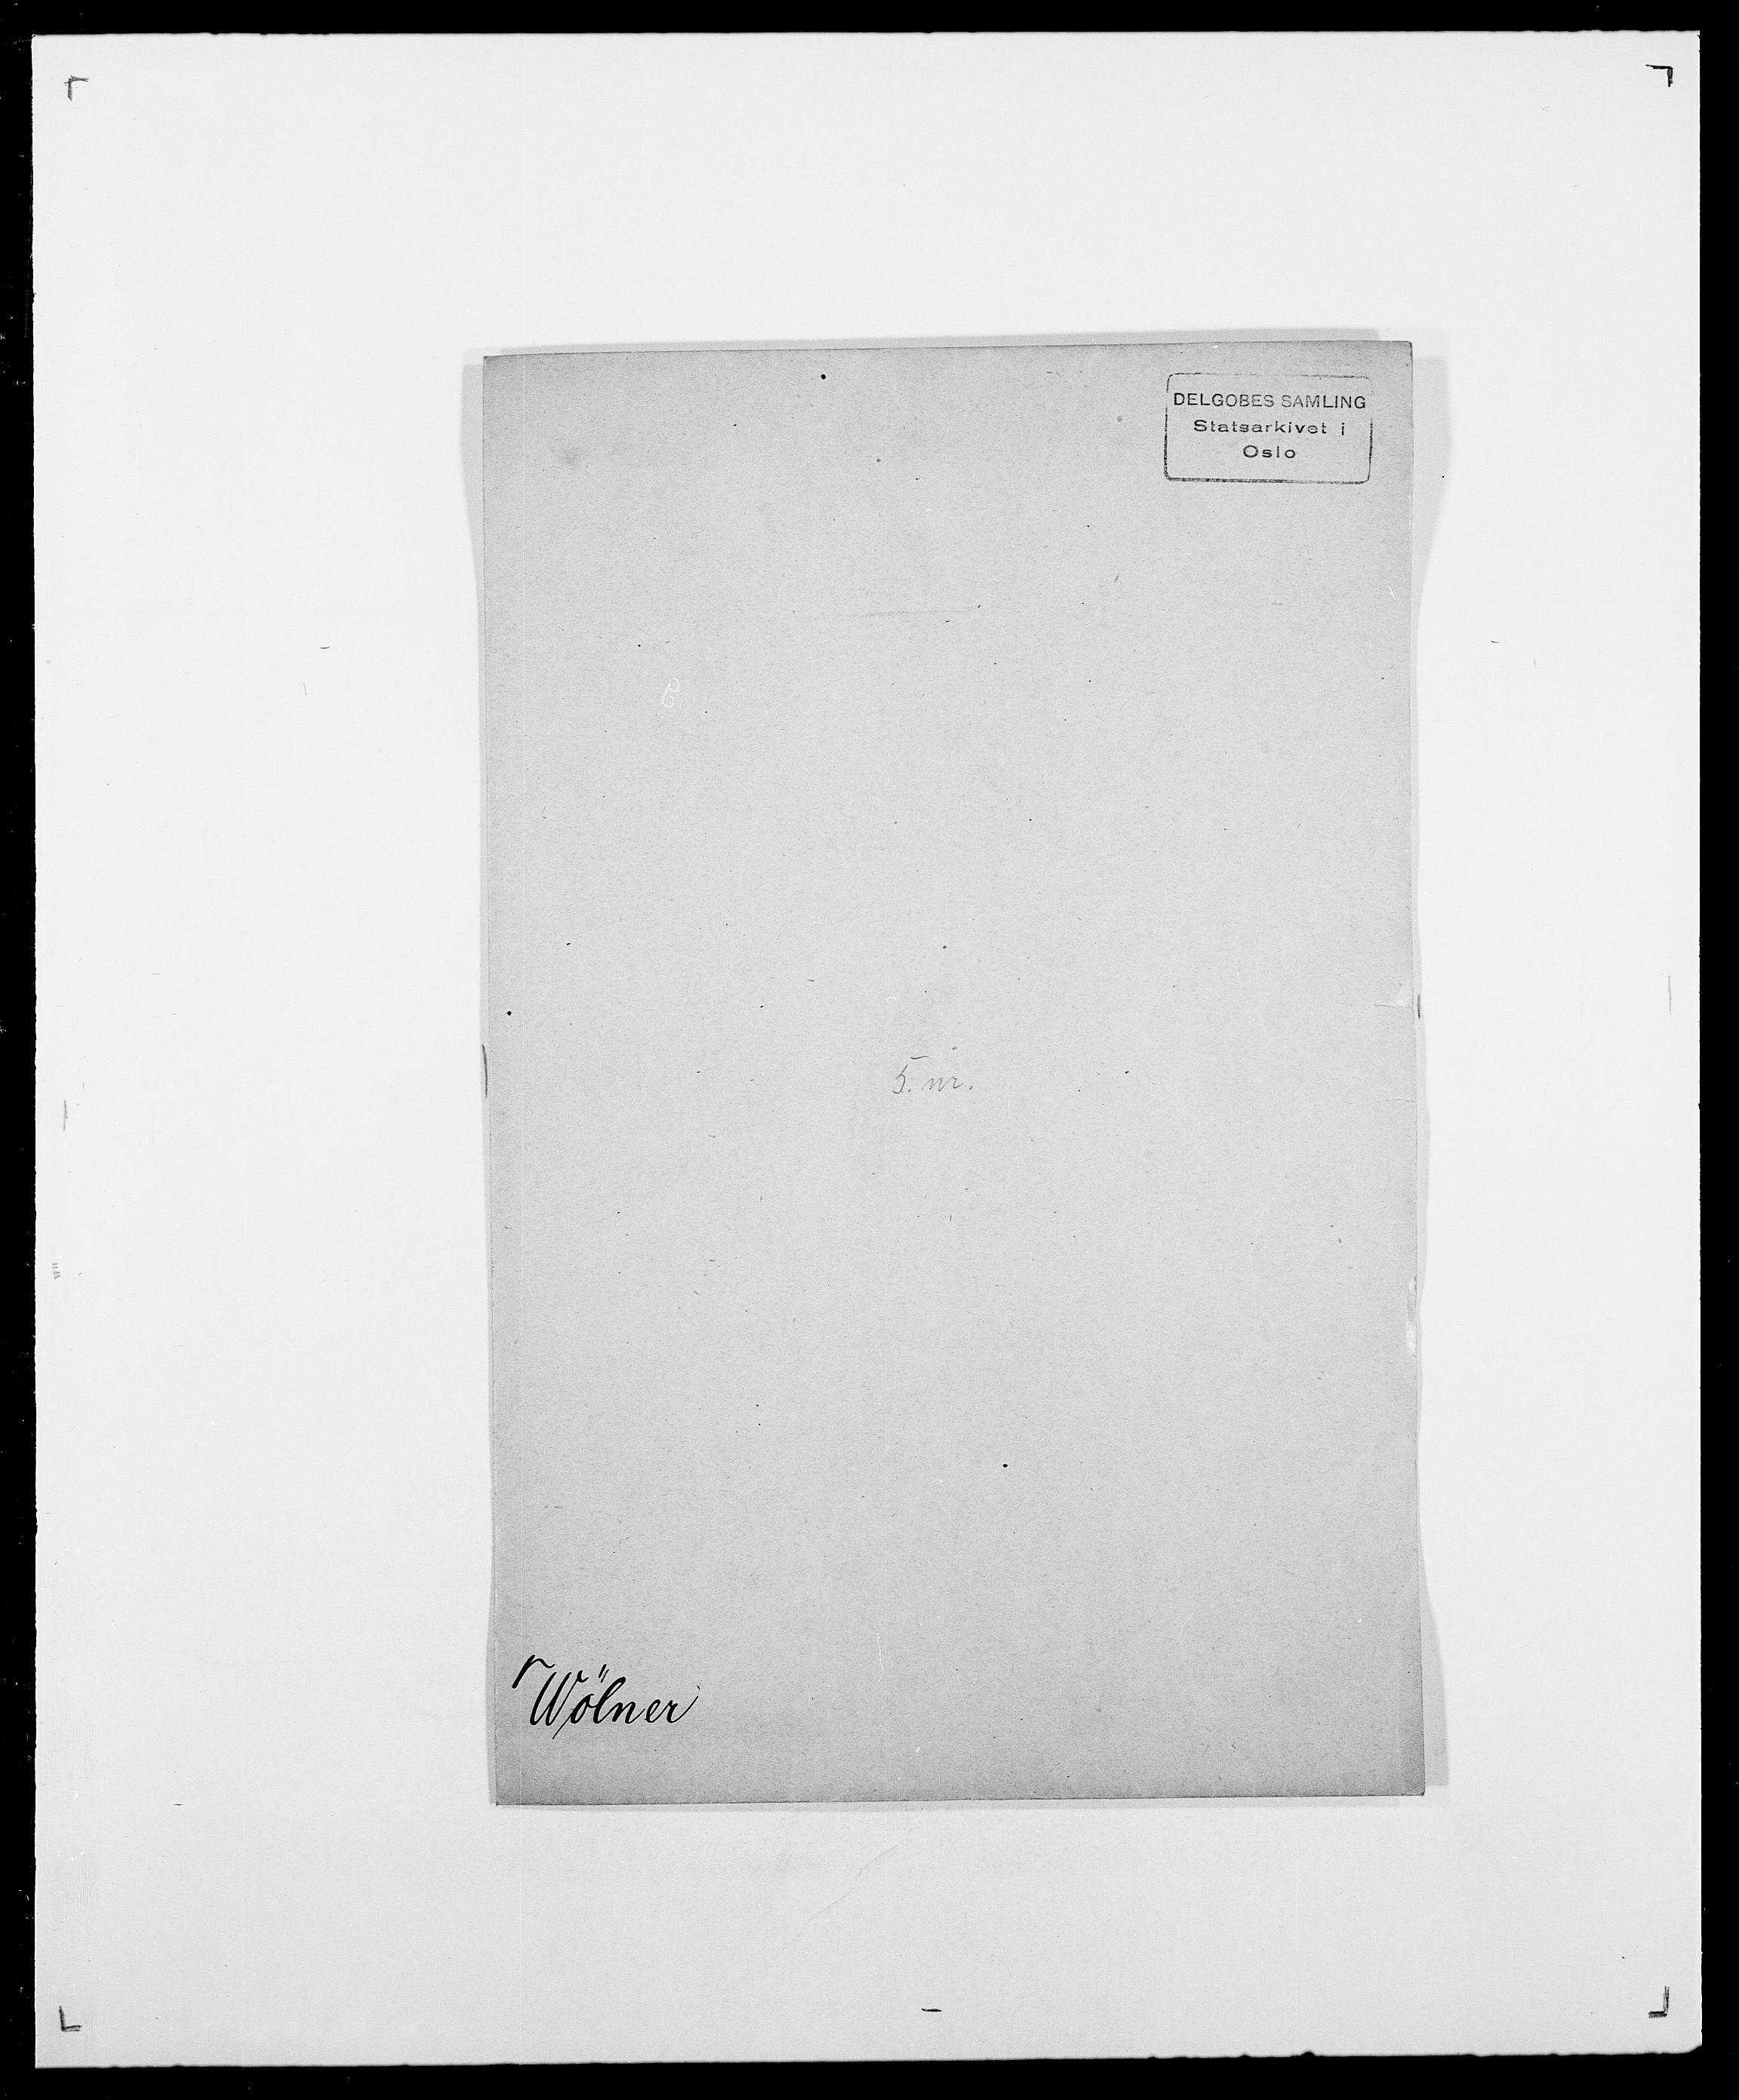 SAO, Delgobe, Charles Antoine - samling, D/Da/L0043: Wulfsberg - v. Zanten, s. 40